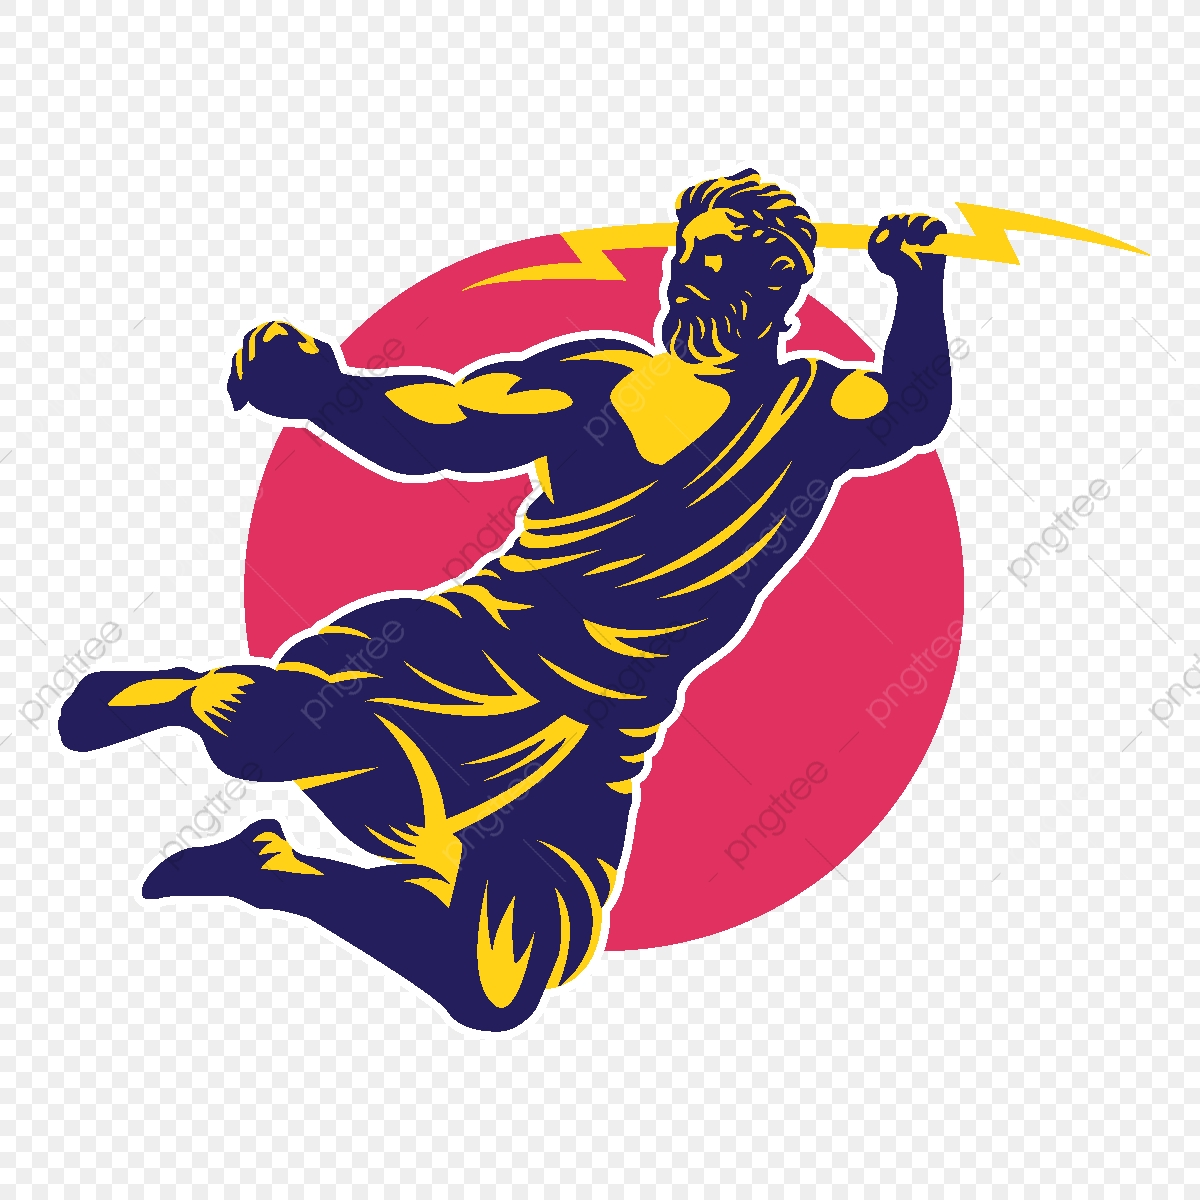 Zeus Thunderbolt Gods Mascot Logo Template, Design ...